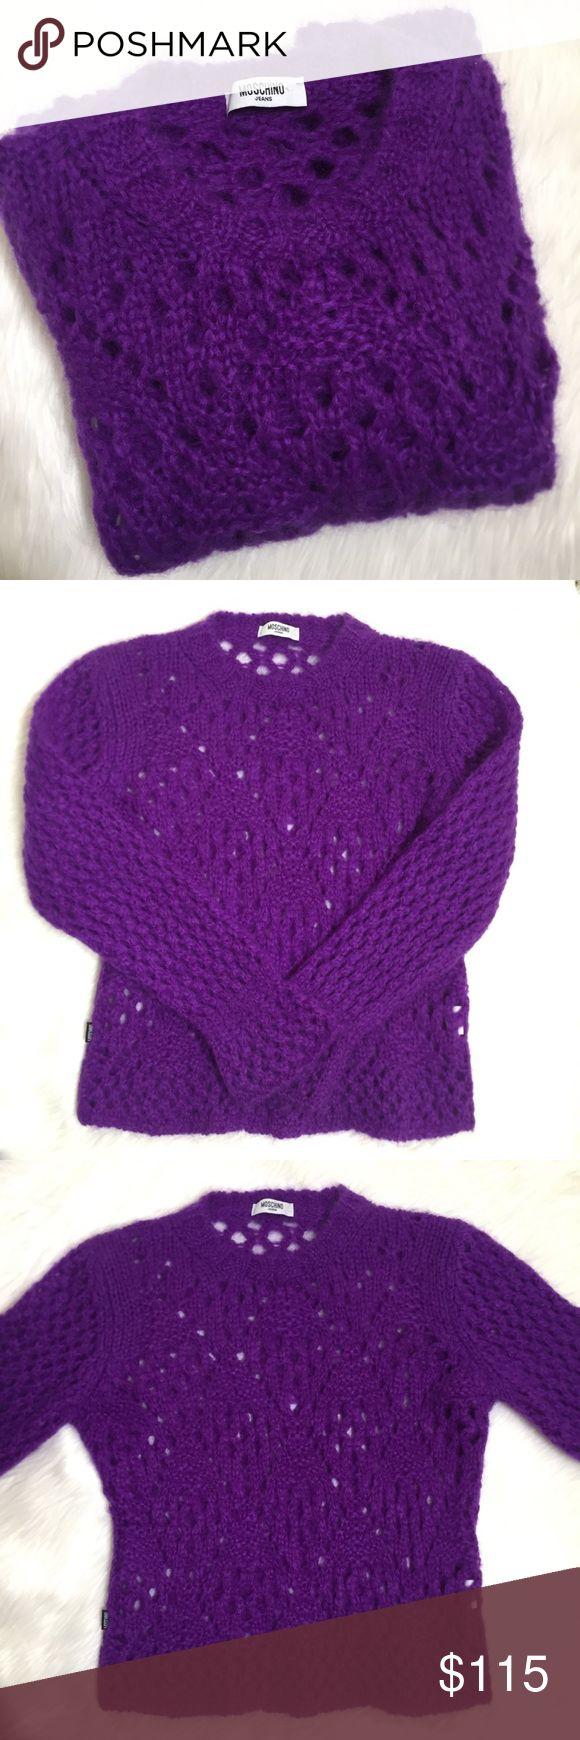 Best 25+ Purple chests ideas on Pinterest | Purple furniture ...